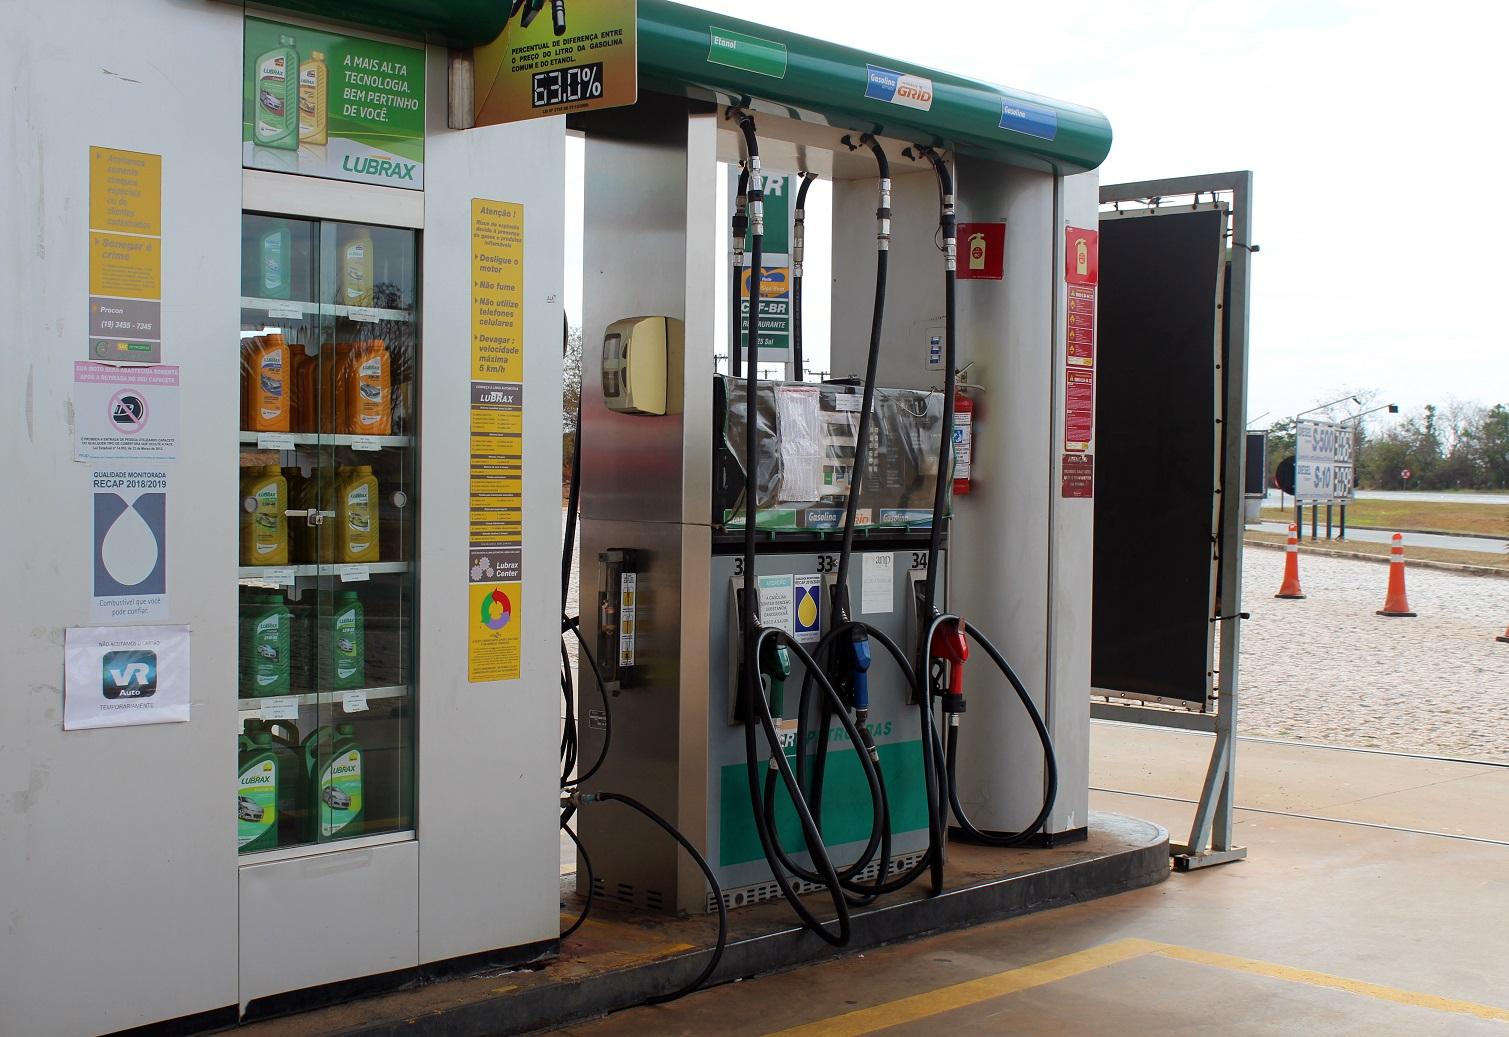 percentual para escolher entre etanol ou gasolina na bomba do posto pode chegar a 75 por cento